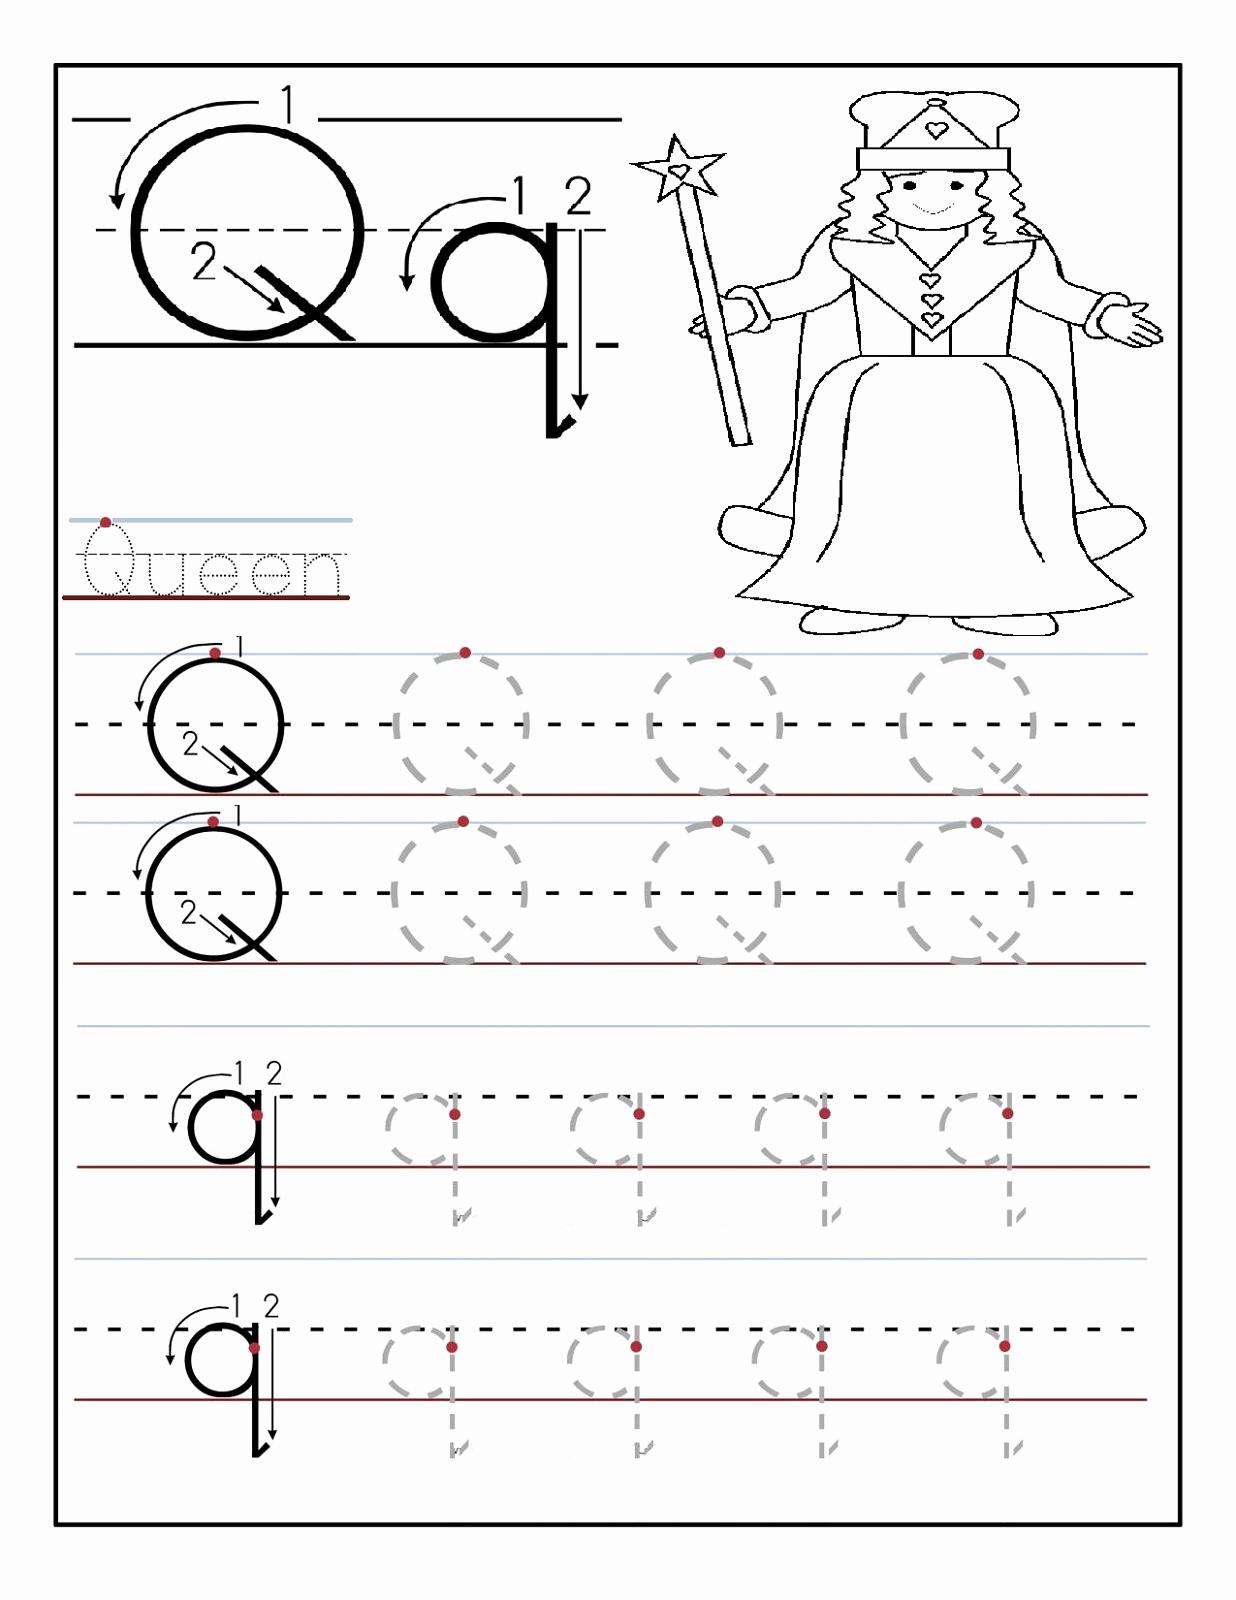 Alphabet Trace Worksheet Beautiful Preschool Alphabet Worksheets